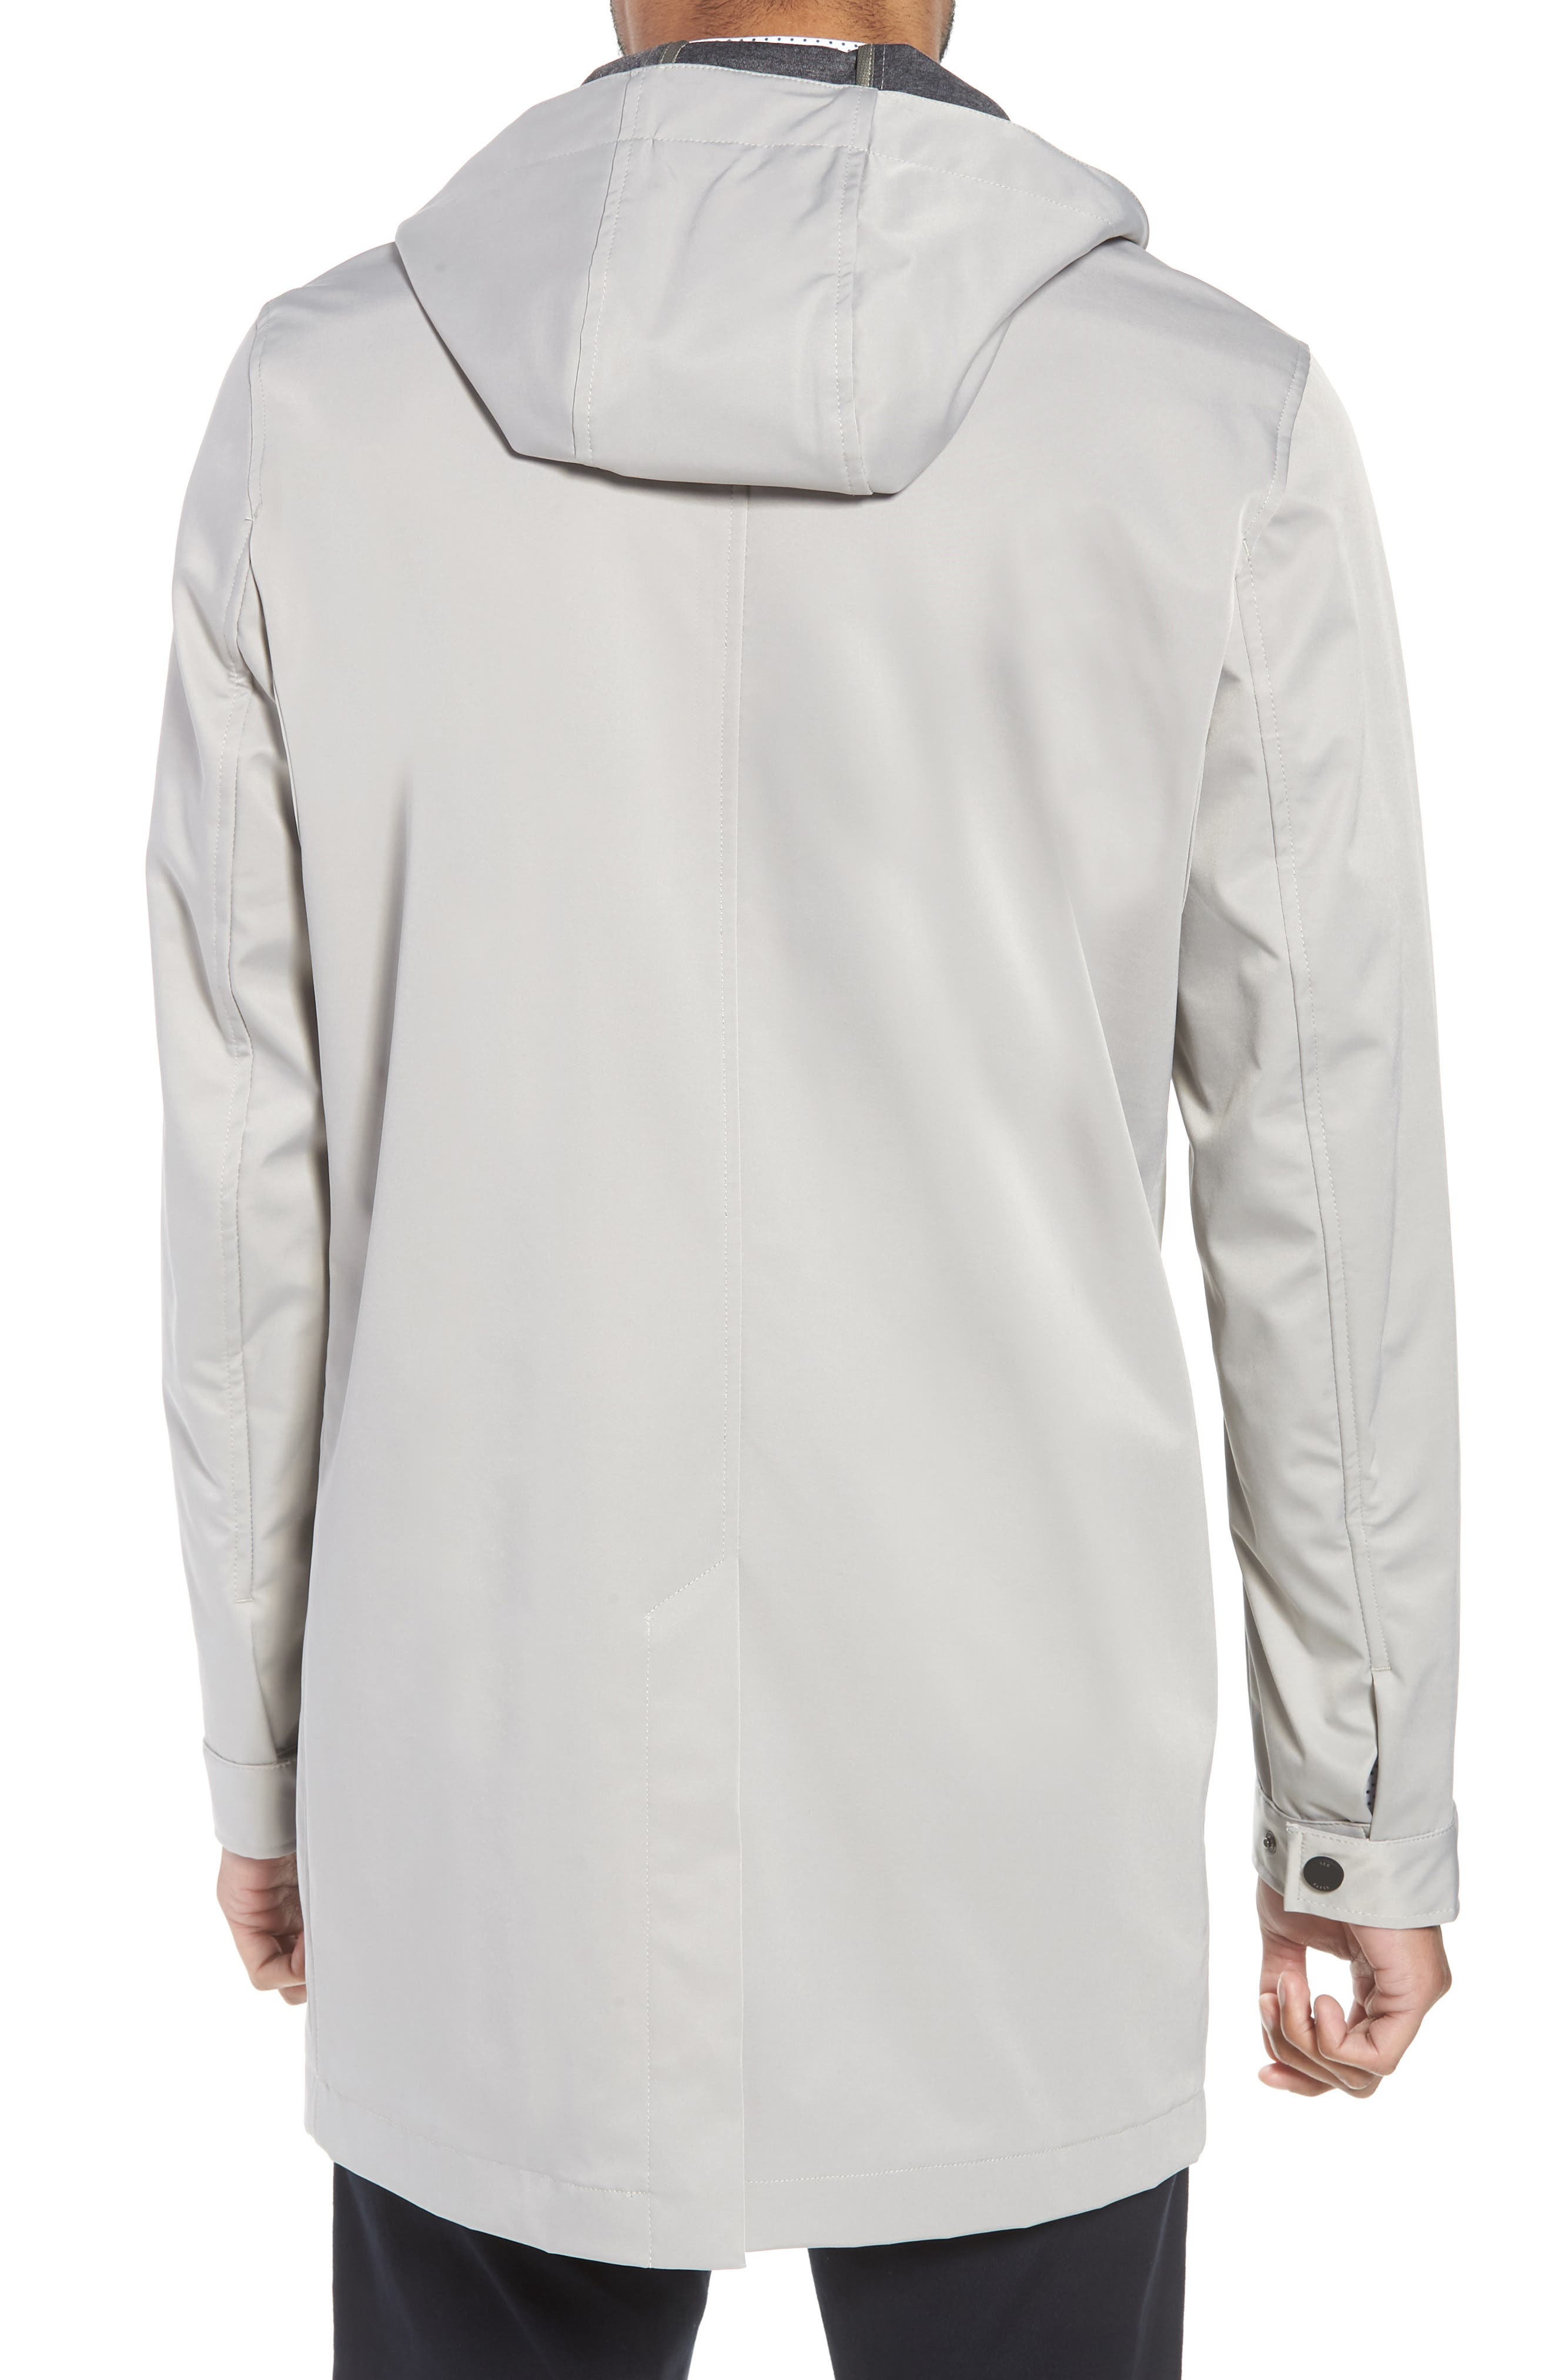 Verner Hooded Mac Jacket,                             Alternate thumbnail 2, color,                             Taupe